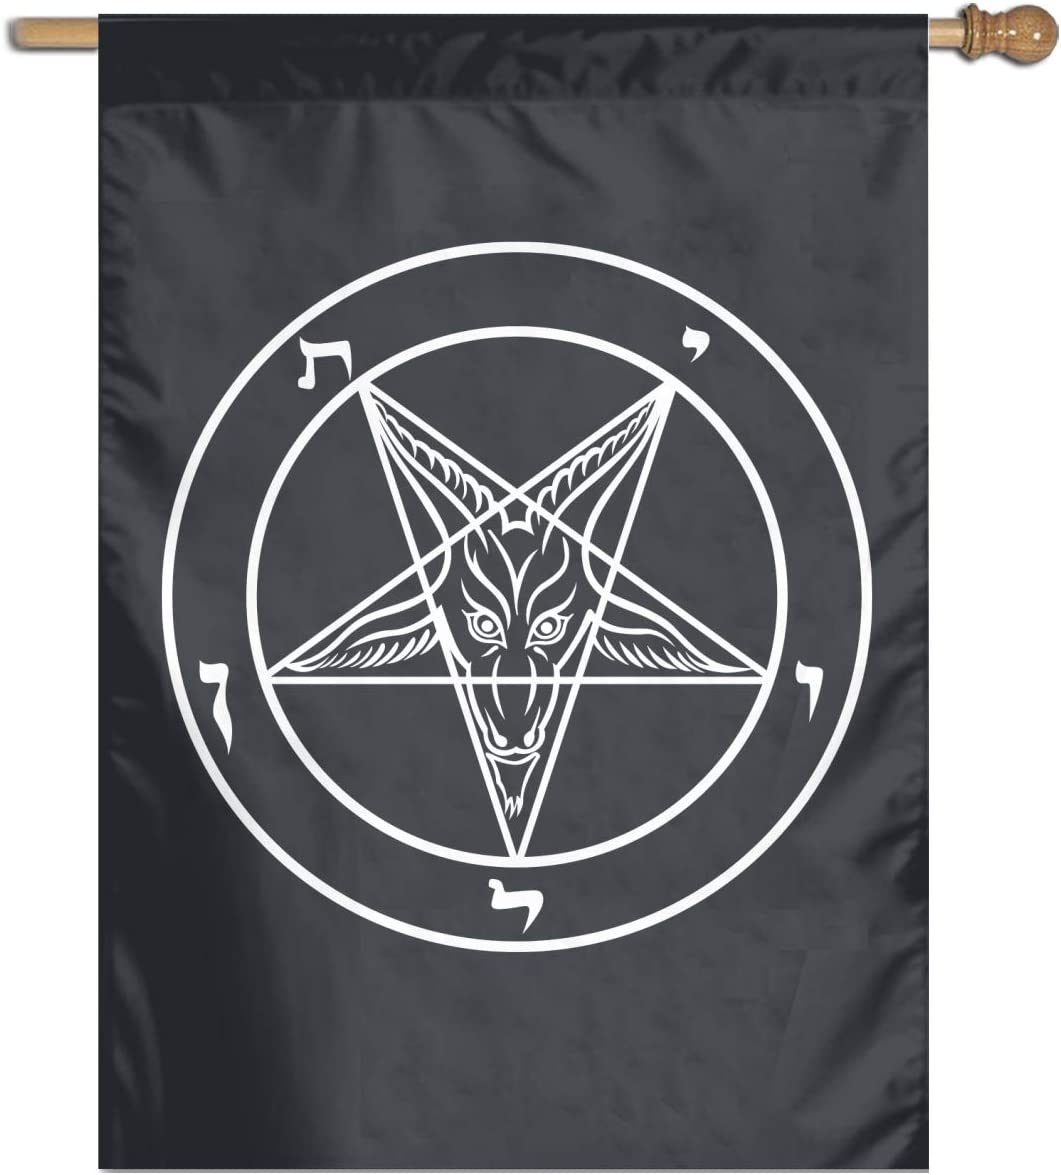 Wonderbce Satan 27x37inch Garden Flag